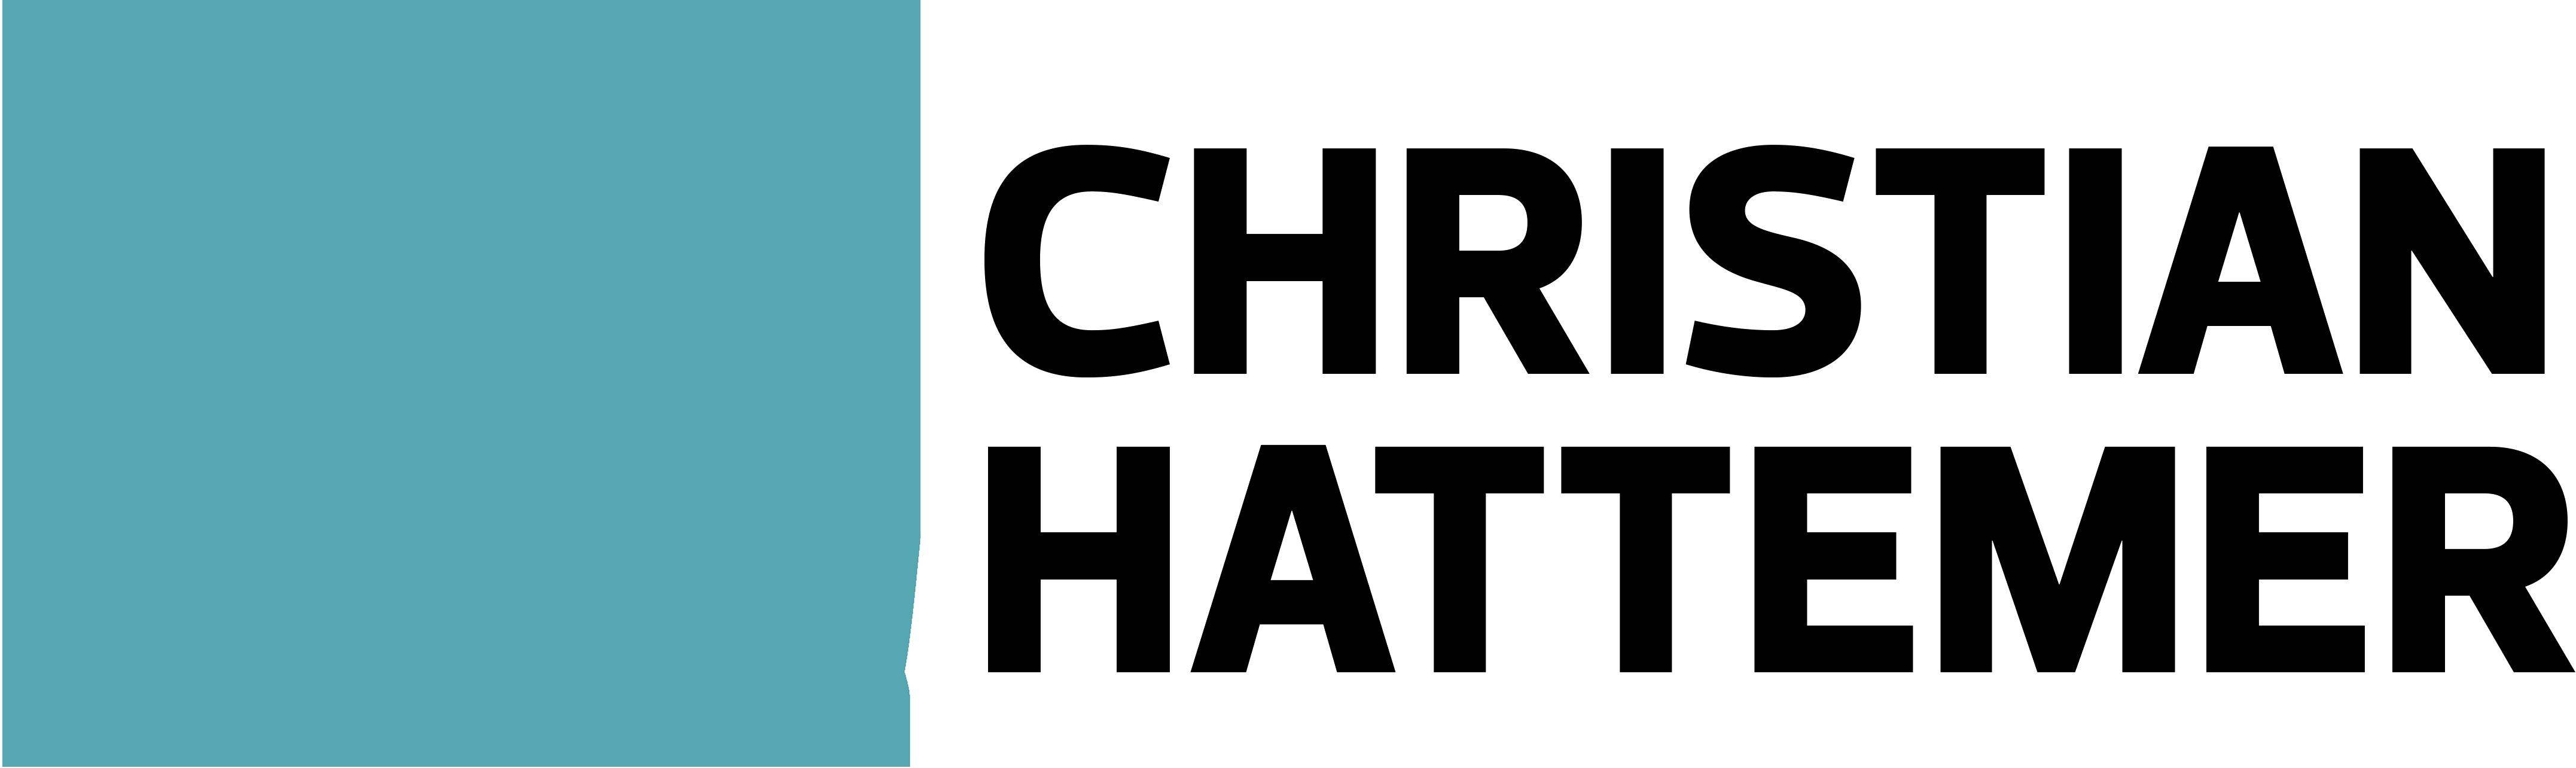 Christian Hattemer